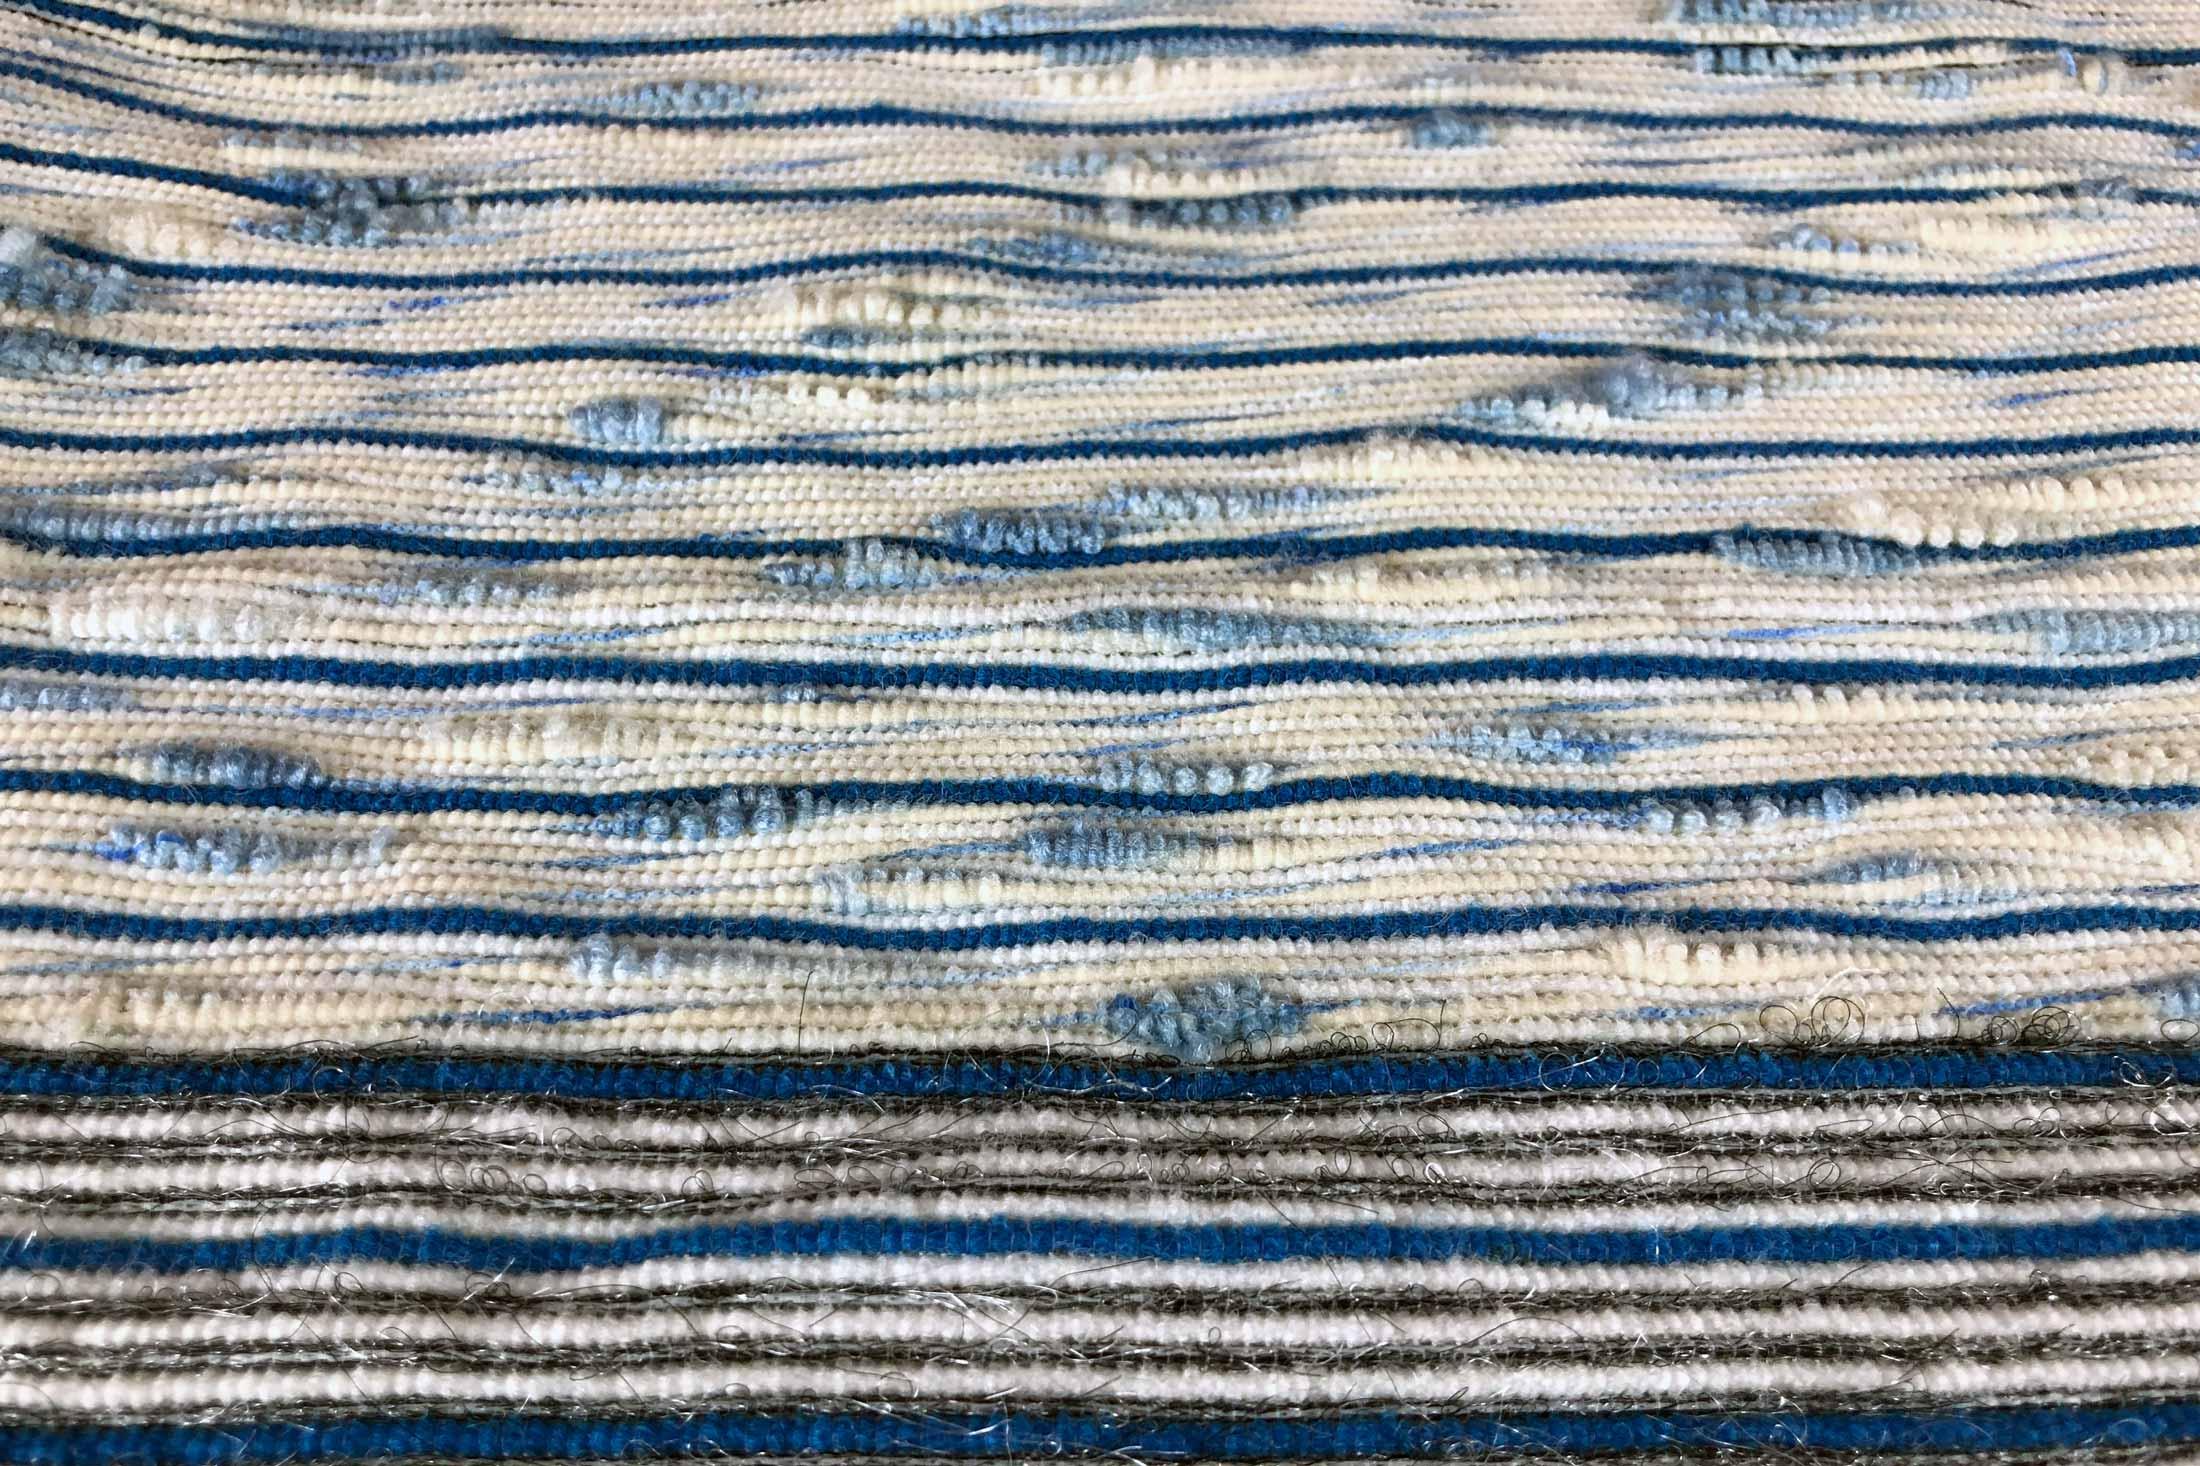 textile design stripes weaving blue white